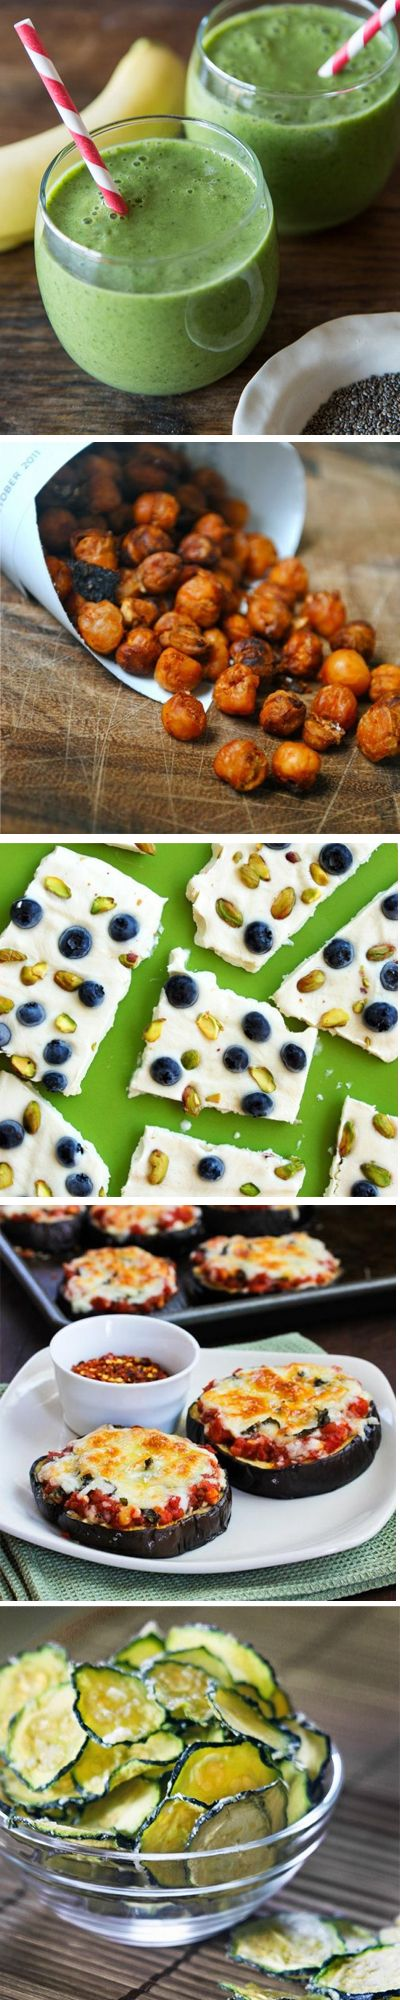 Gesunde Snacks - die leckersten Rezepte gibt's hier: http://www.gofeminin.de/kochen-backen/gesunde-snacks-rezepte-s1377107.html #snacks #healthy #delicious #mhmmm #food